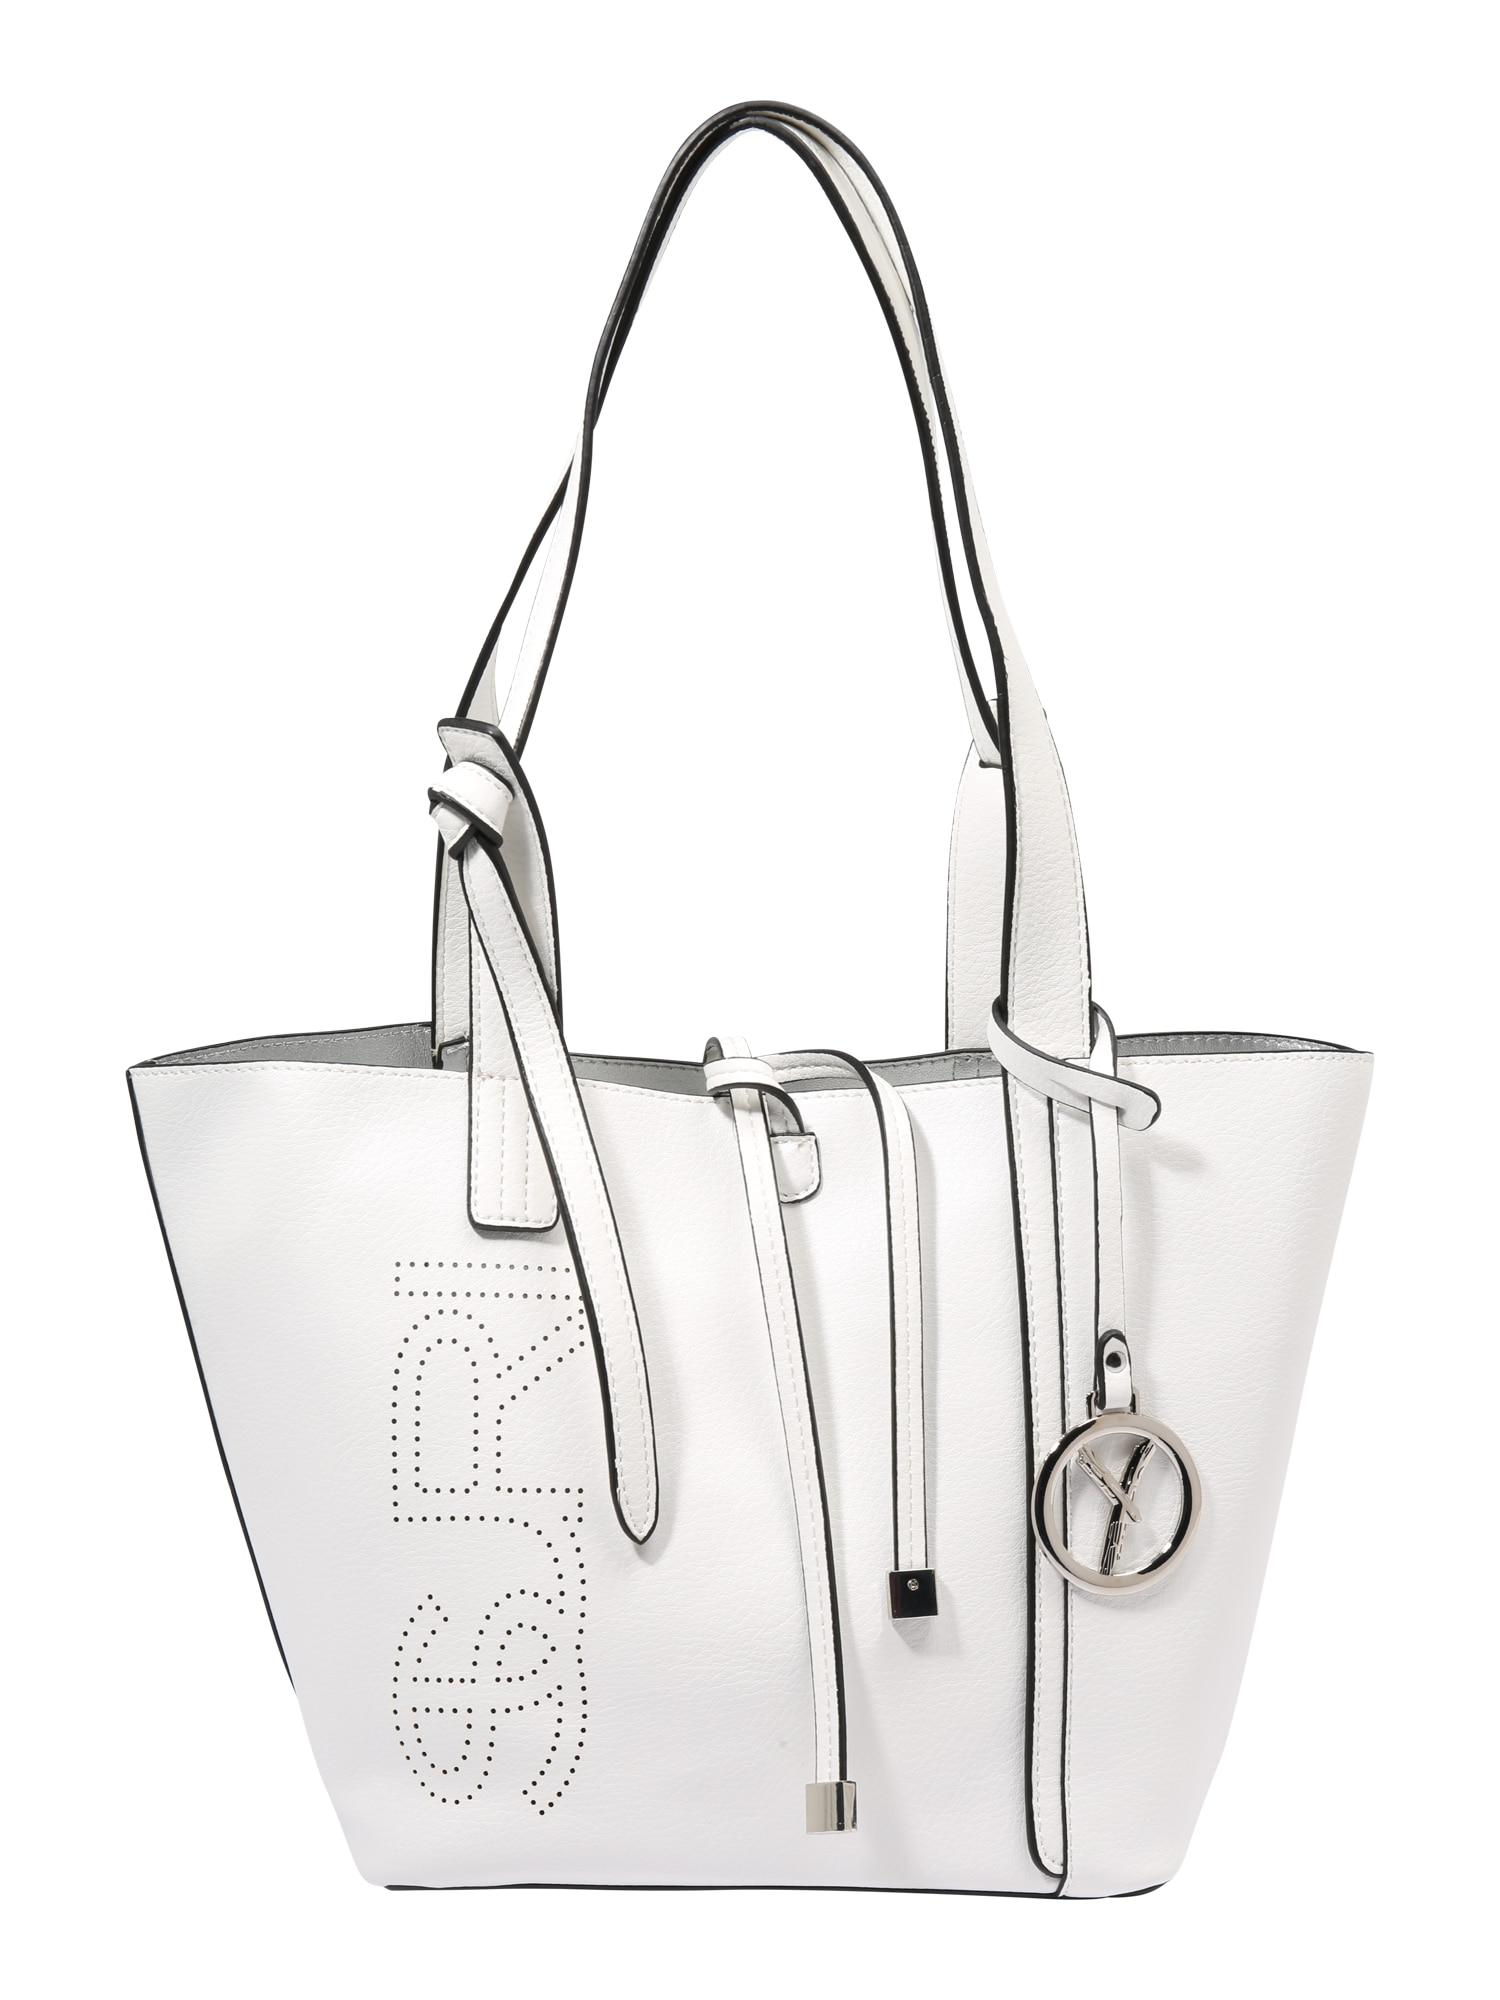 Nákupní taška Issy bílá Suri Frey